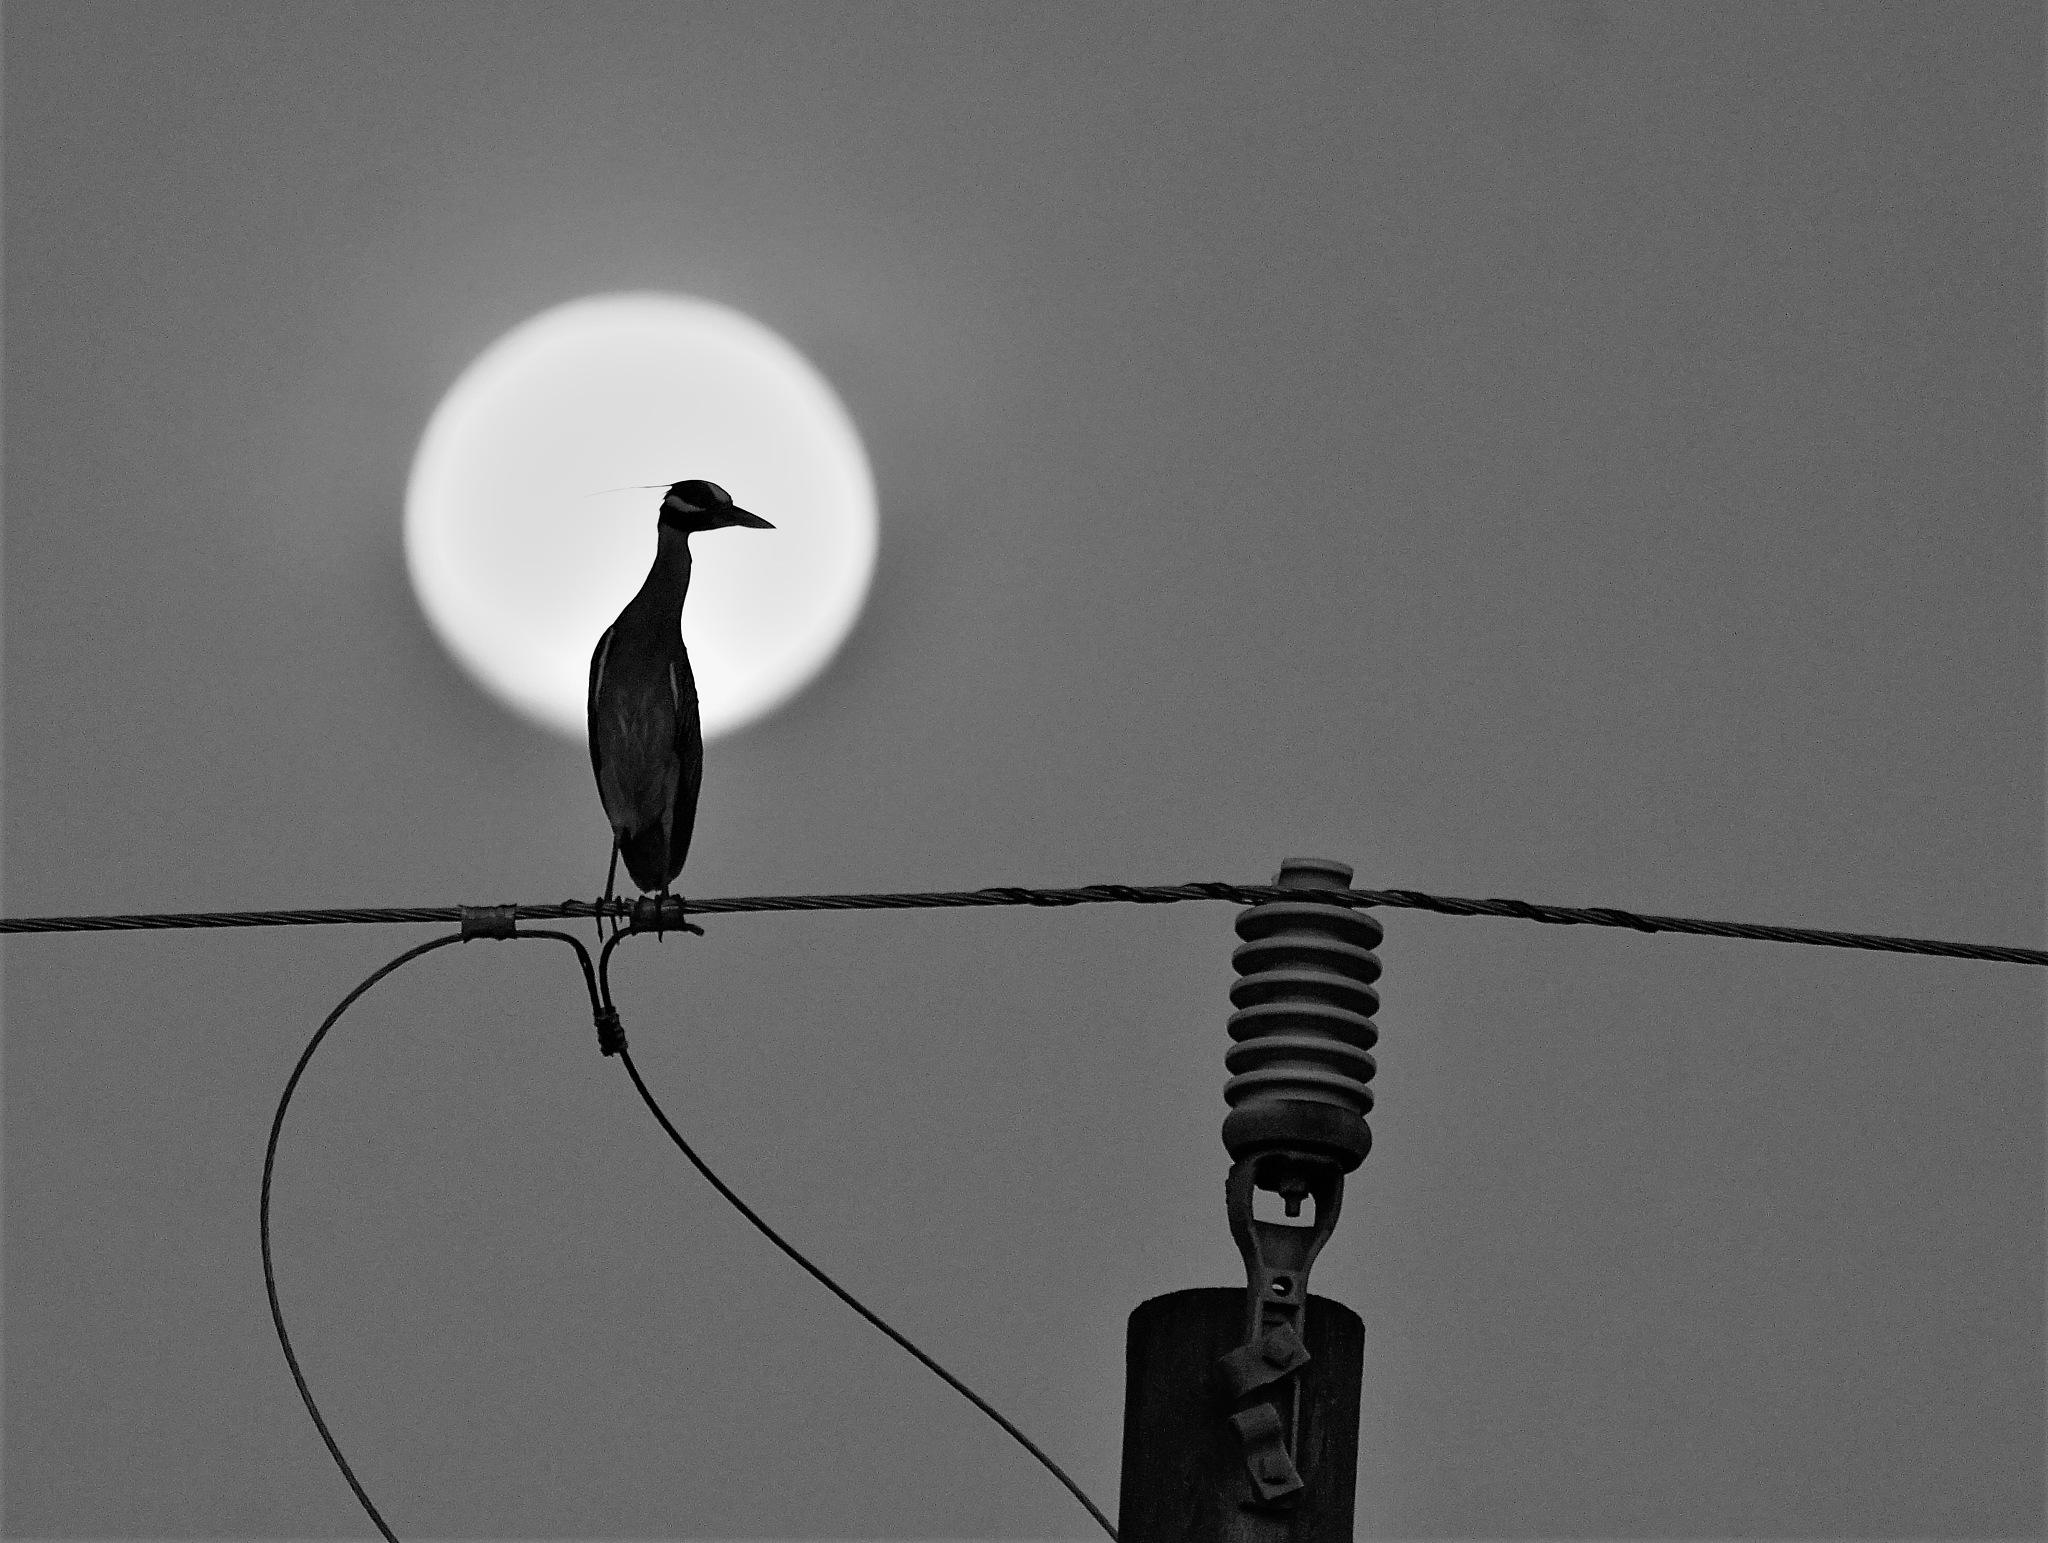 Yellow-crowned Night Heron by MichaelDorsey